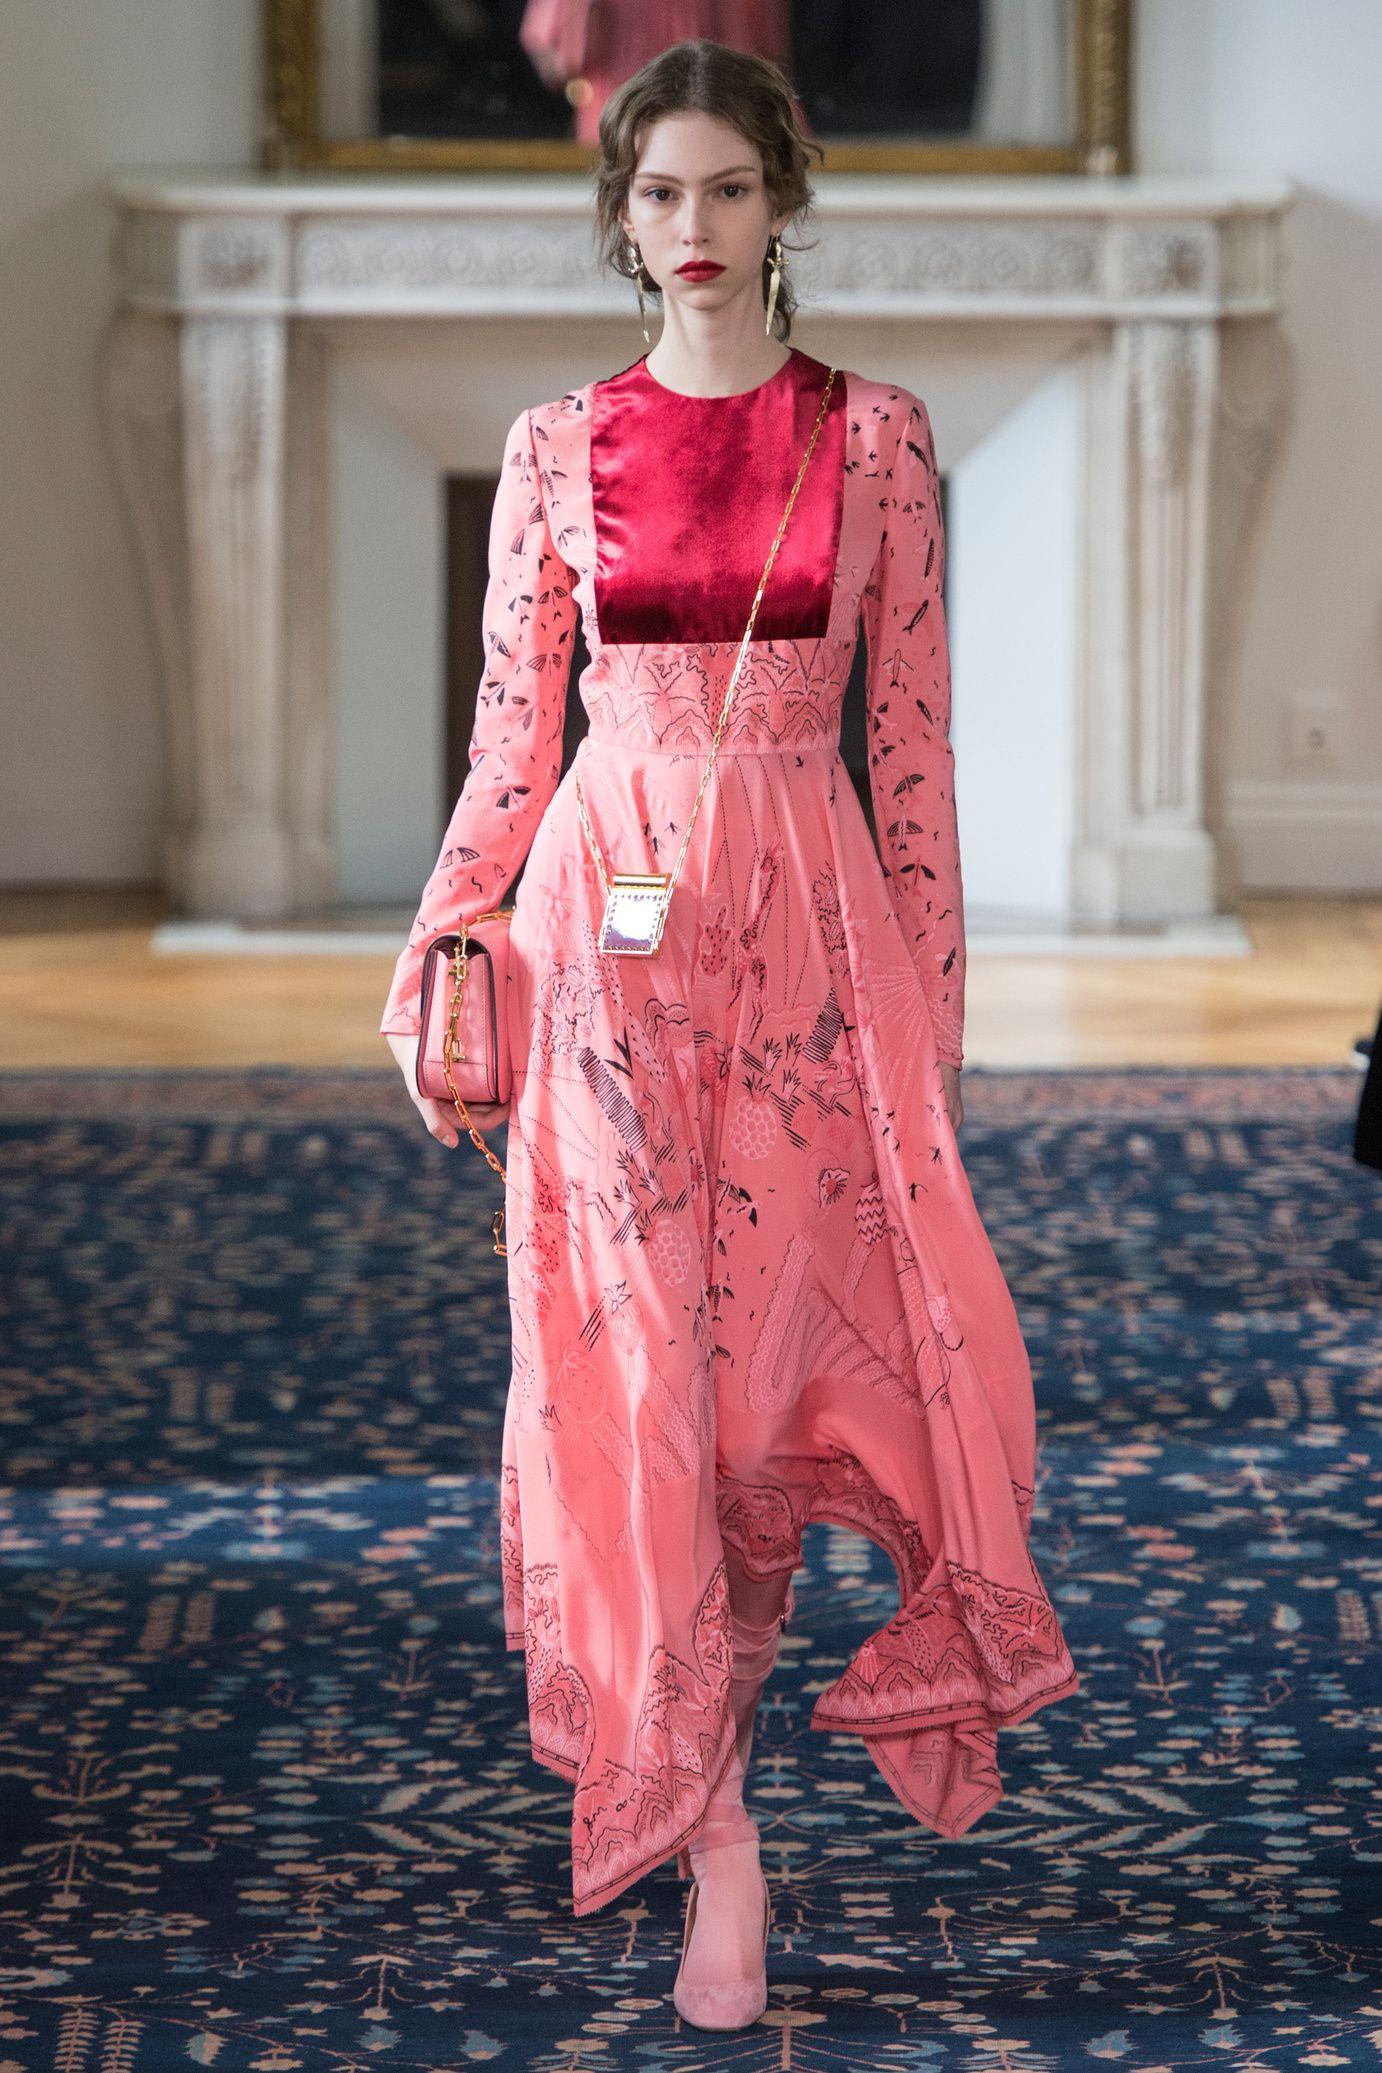 Défilé Valentino: Printemps-été 2017 | Moda italiana, Vestidos ...